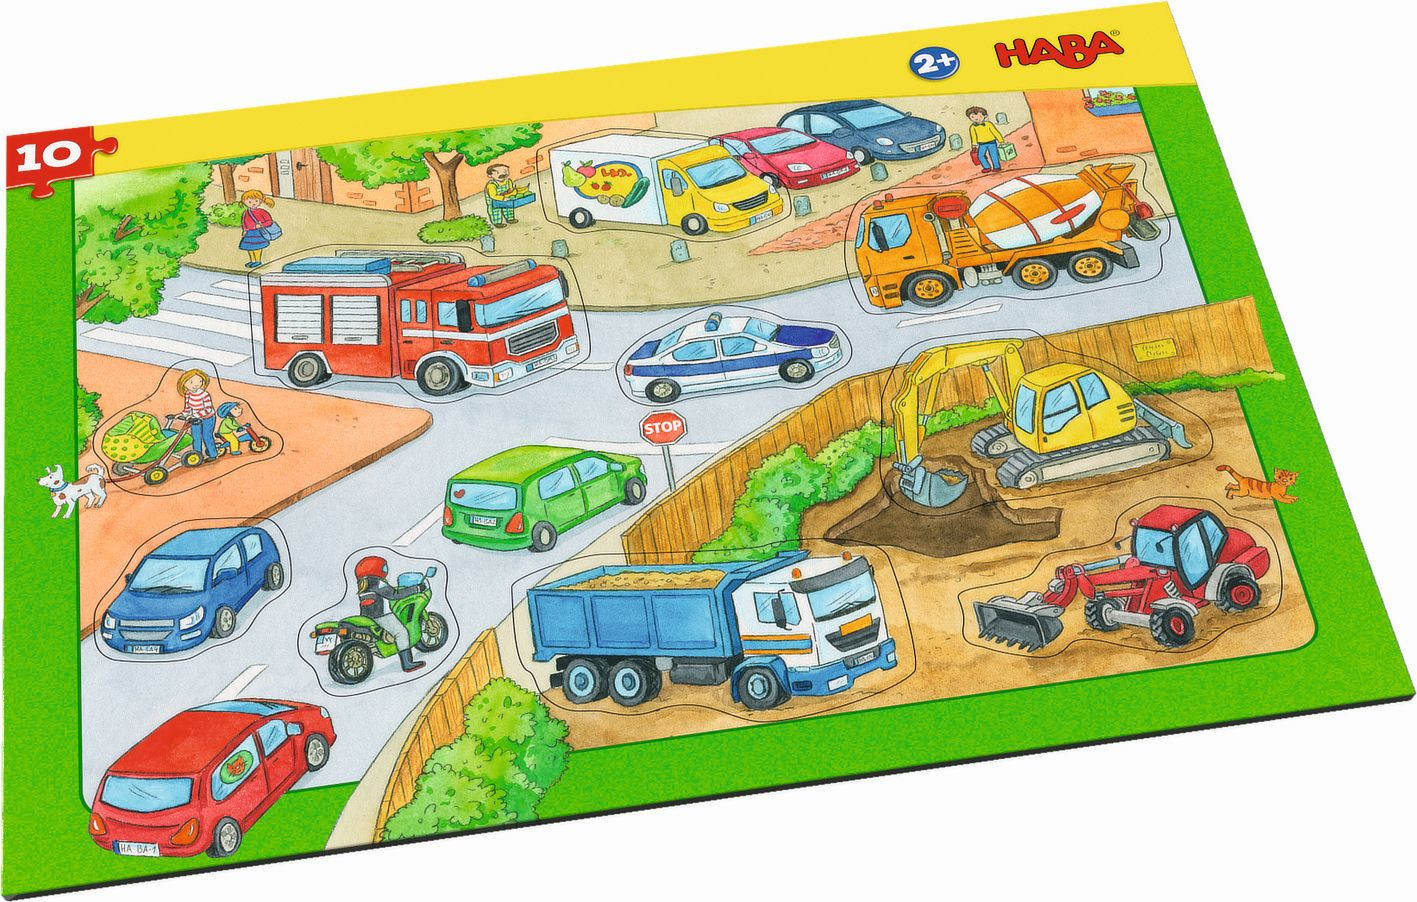 Rahmenpuzzle Fahrzeuge als sonstige Artikel